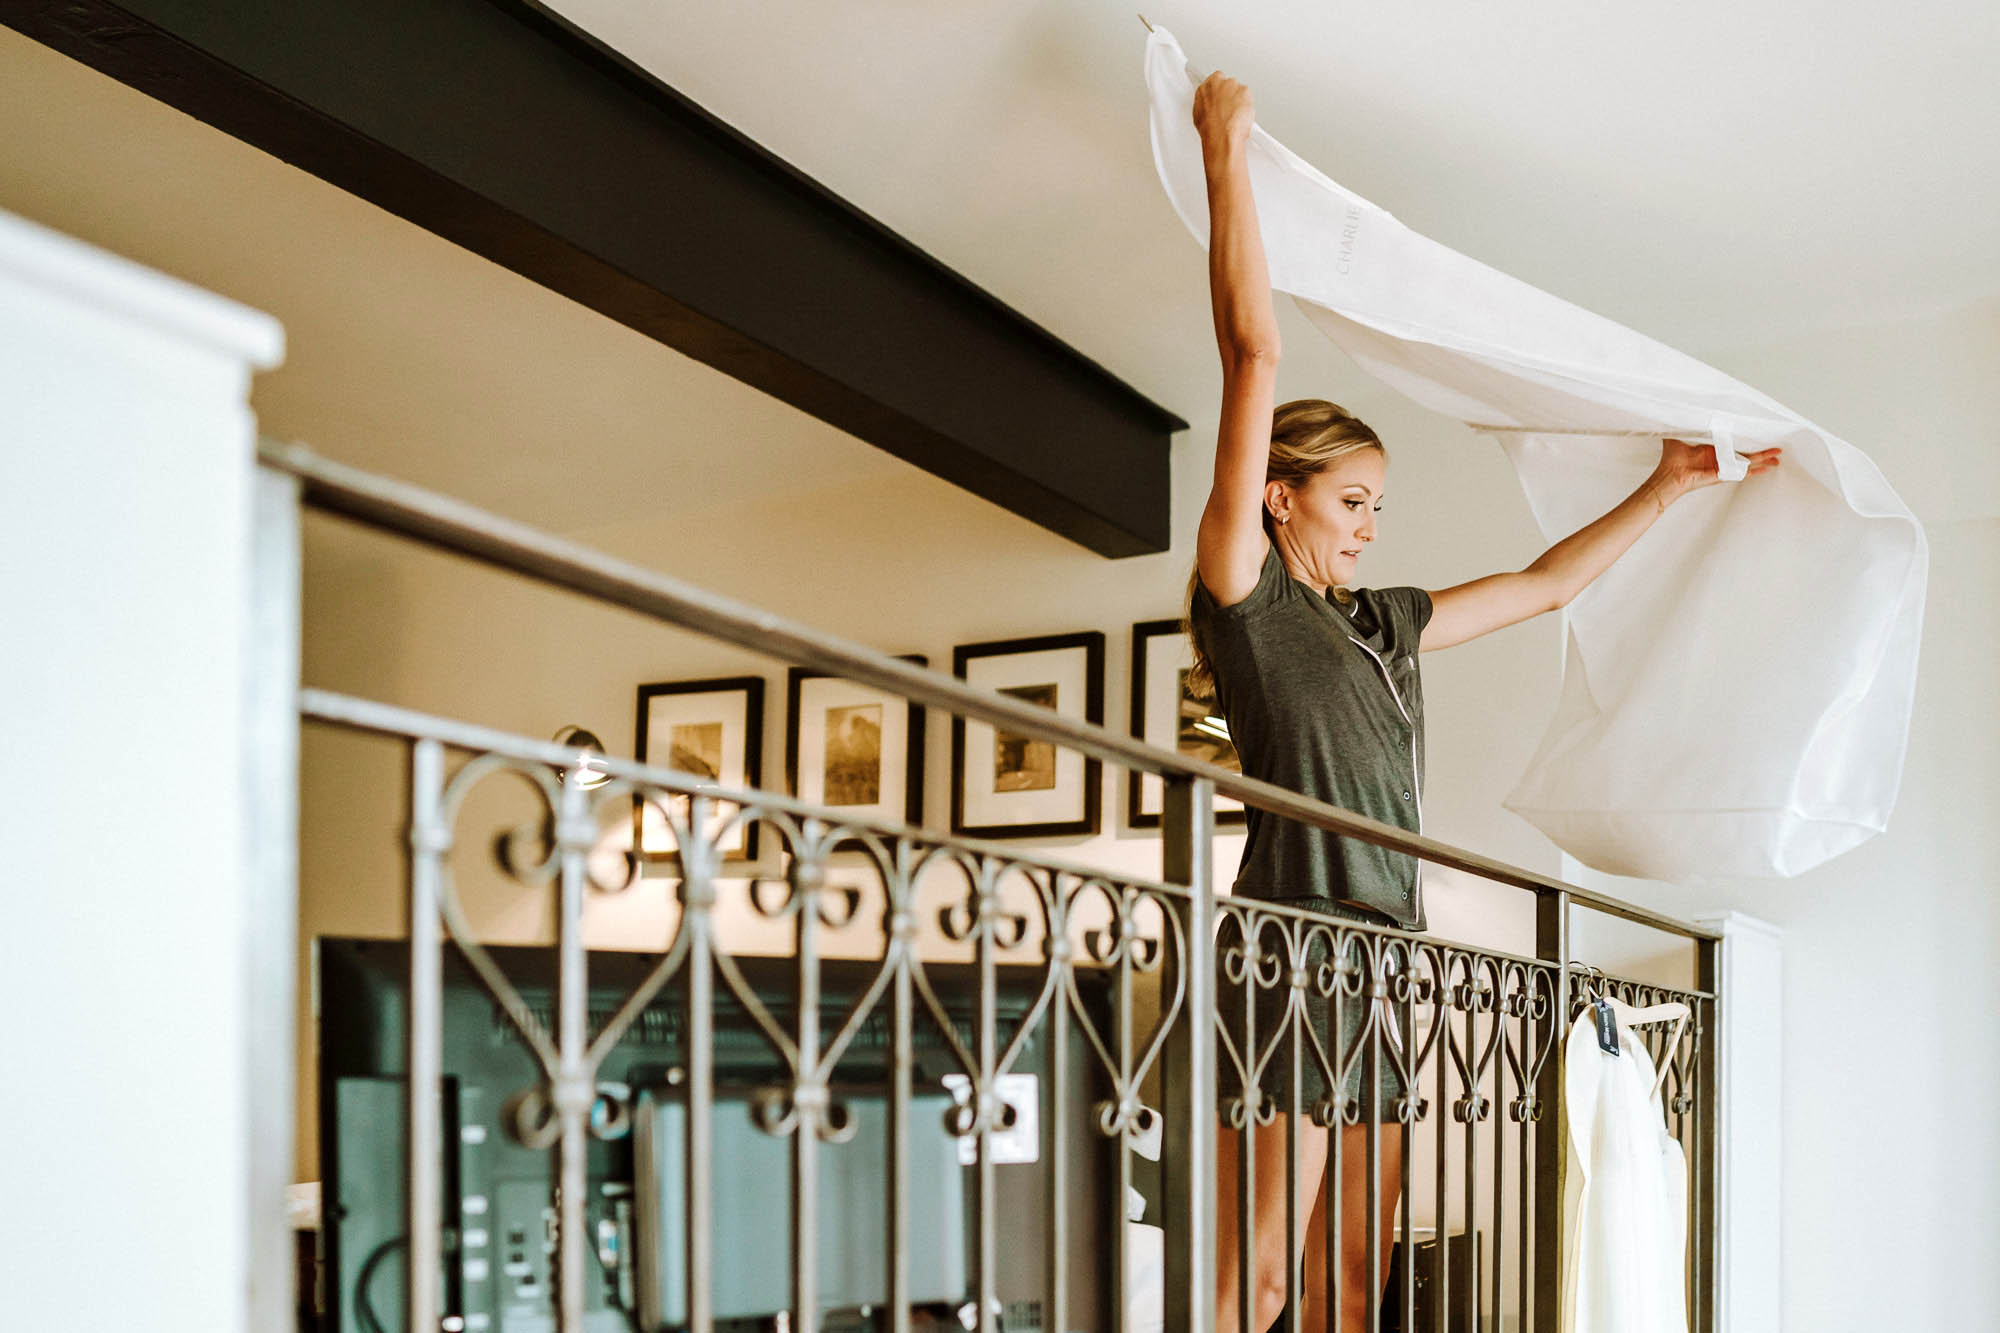 bridesmaid hanging wedding dress over balcony